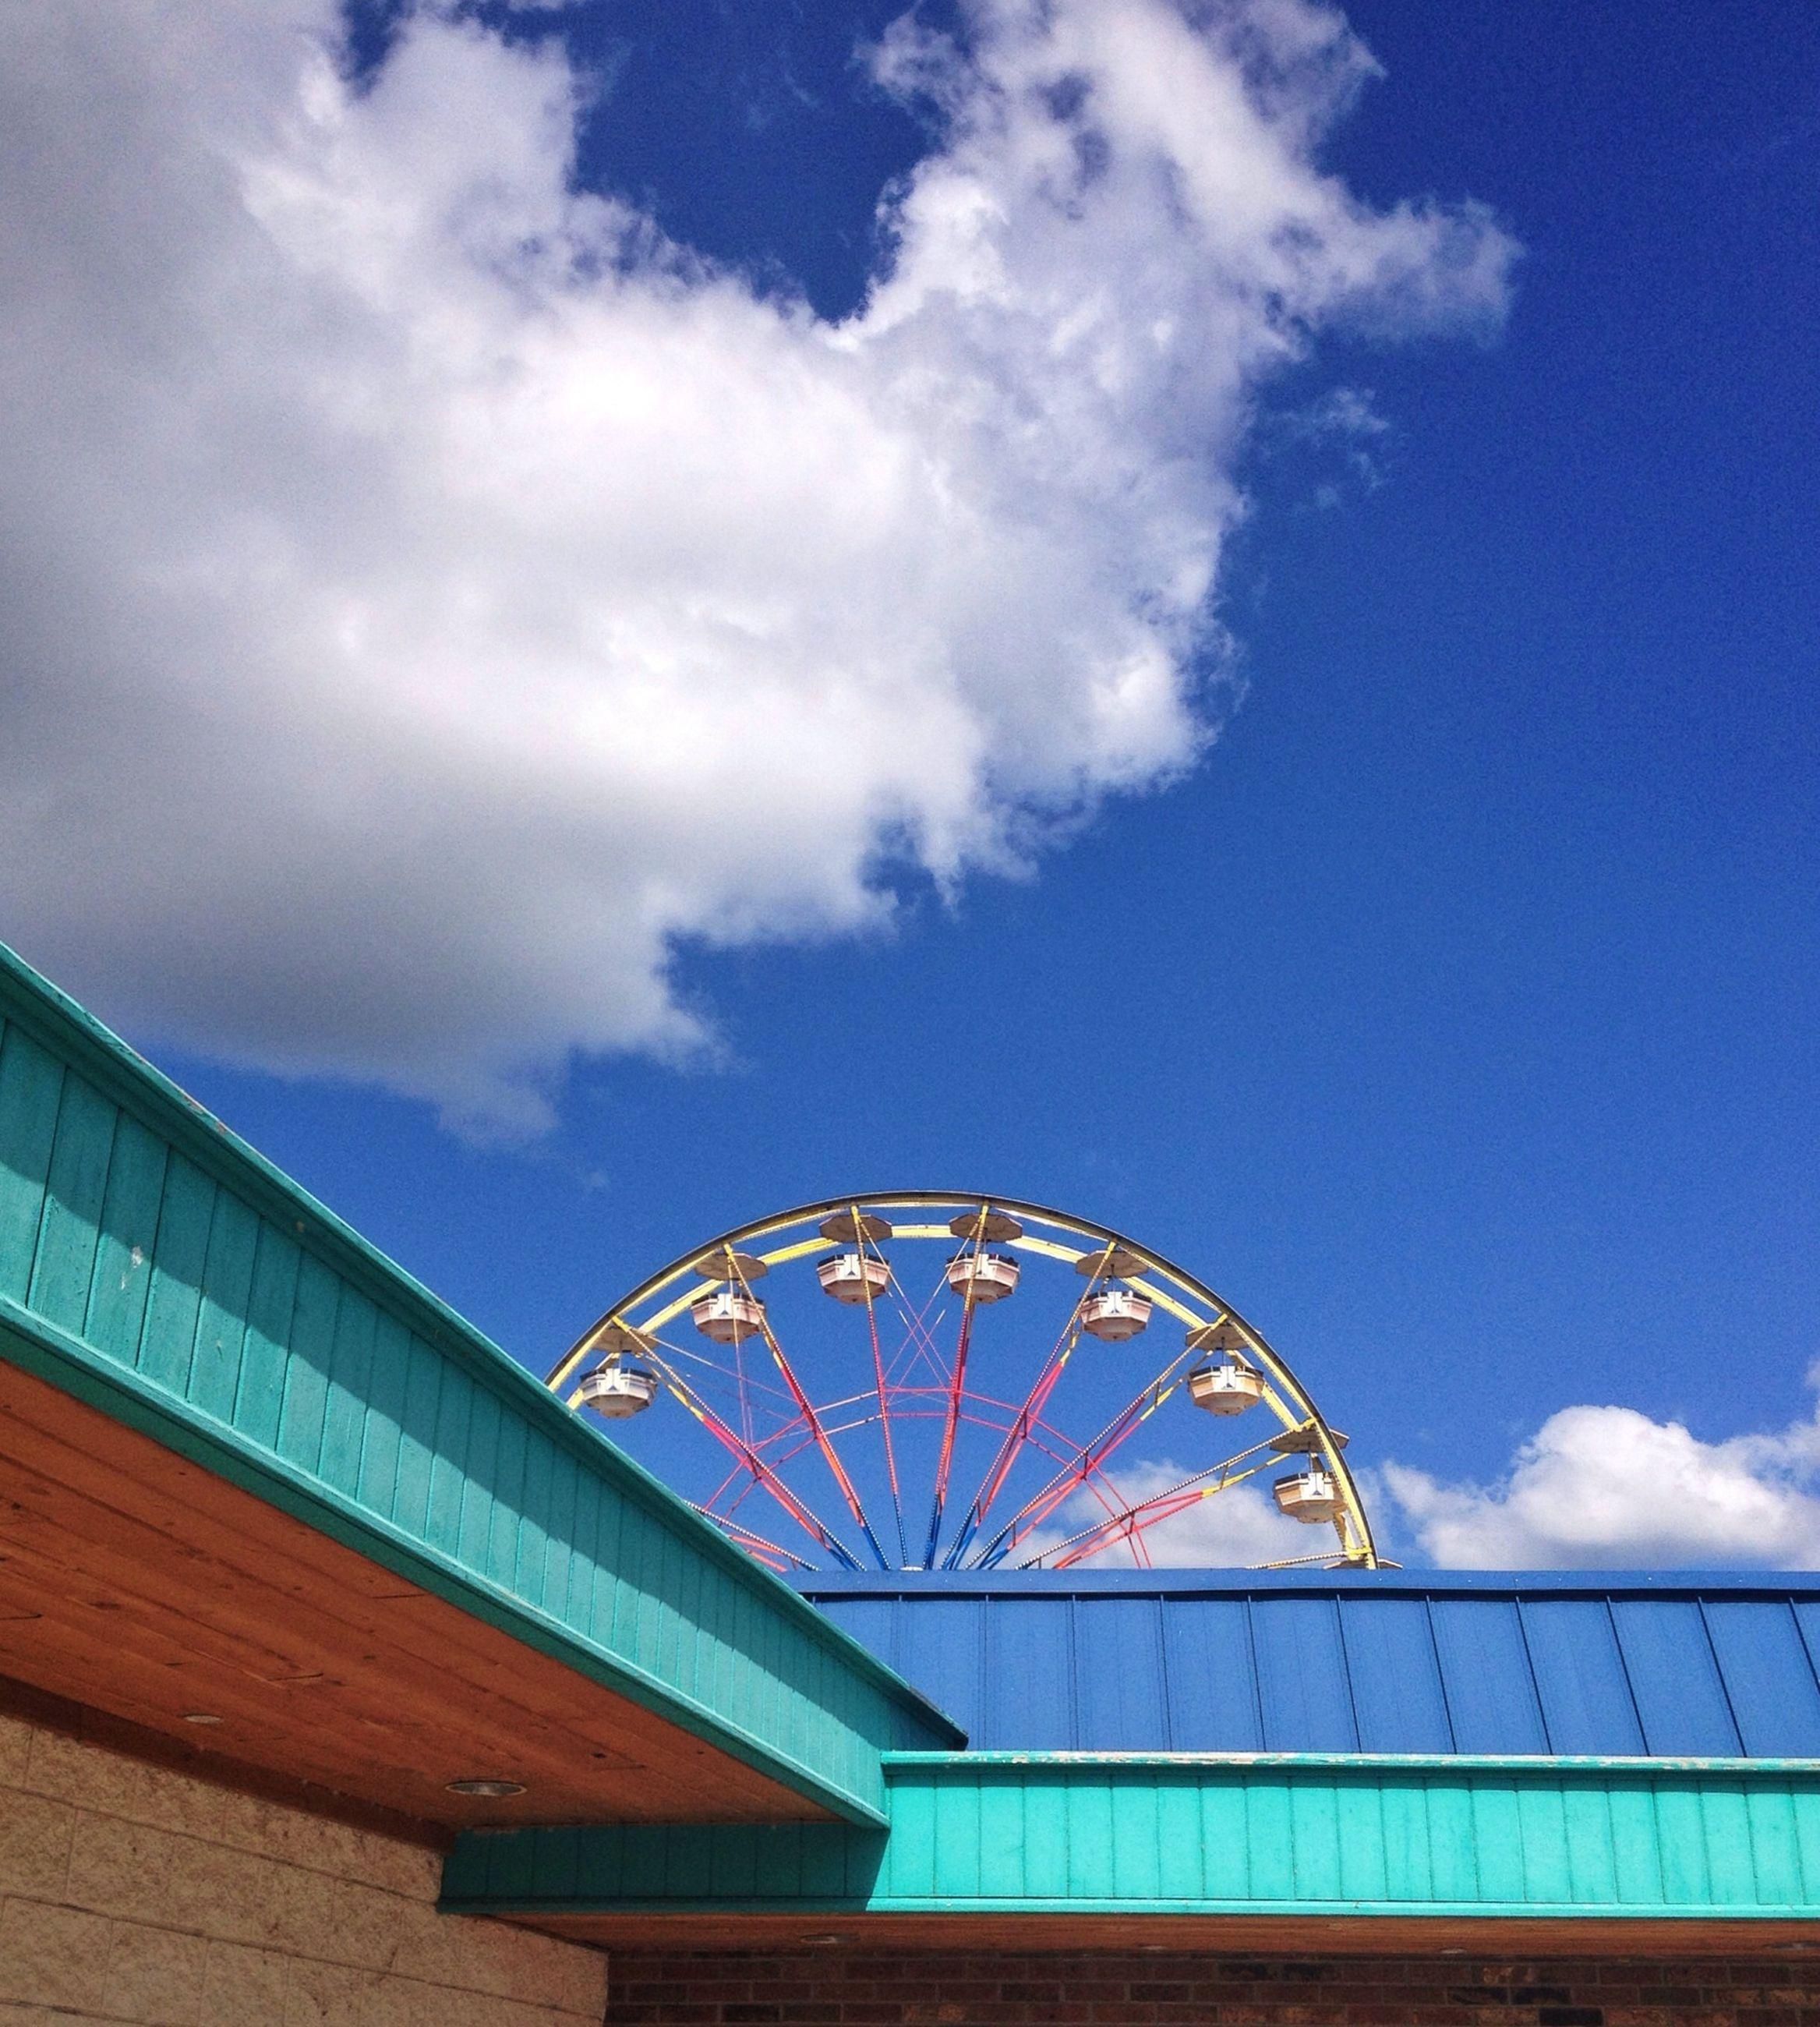 low angle view, sky, built structure, architecture, cloud - sky, blue, cloud, building exterior, cloudy, arts culture and entertainment, day, amusement park, outdoors, ferris wheel, no people, amusement park ride, high section, metal, pattern, design